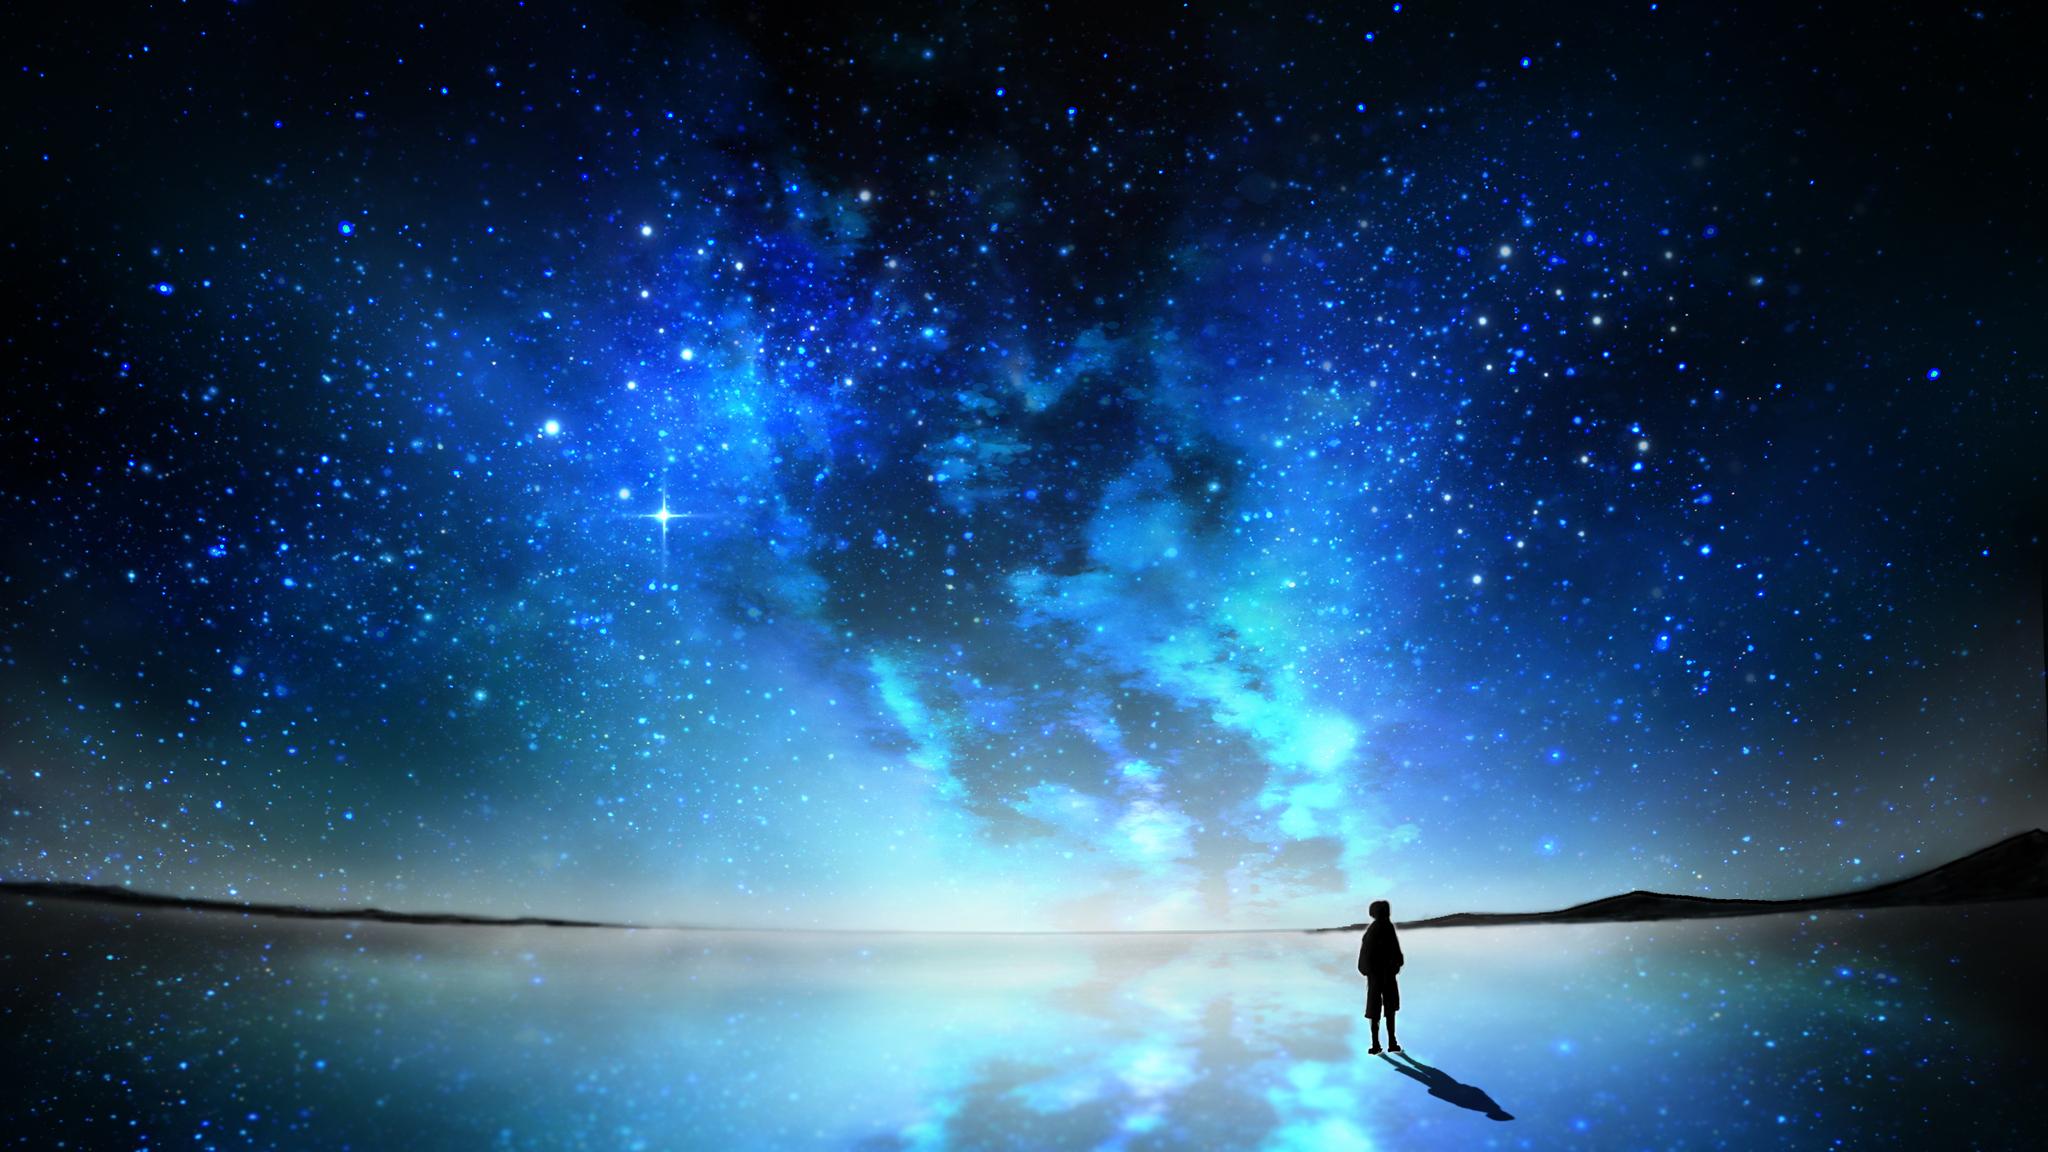 2048x1152 Sky Full Of Stars Anime 2048x1152 Resolution Hd 4k